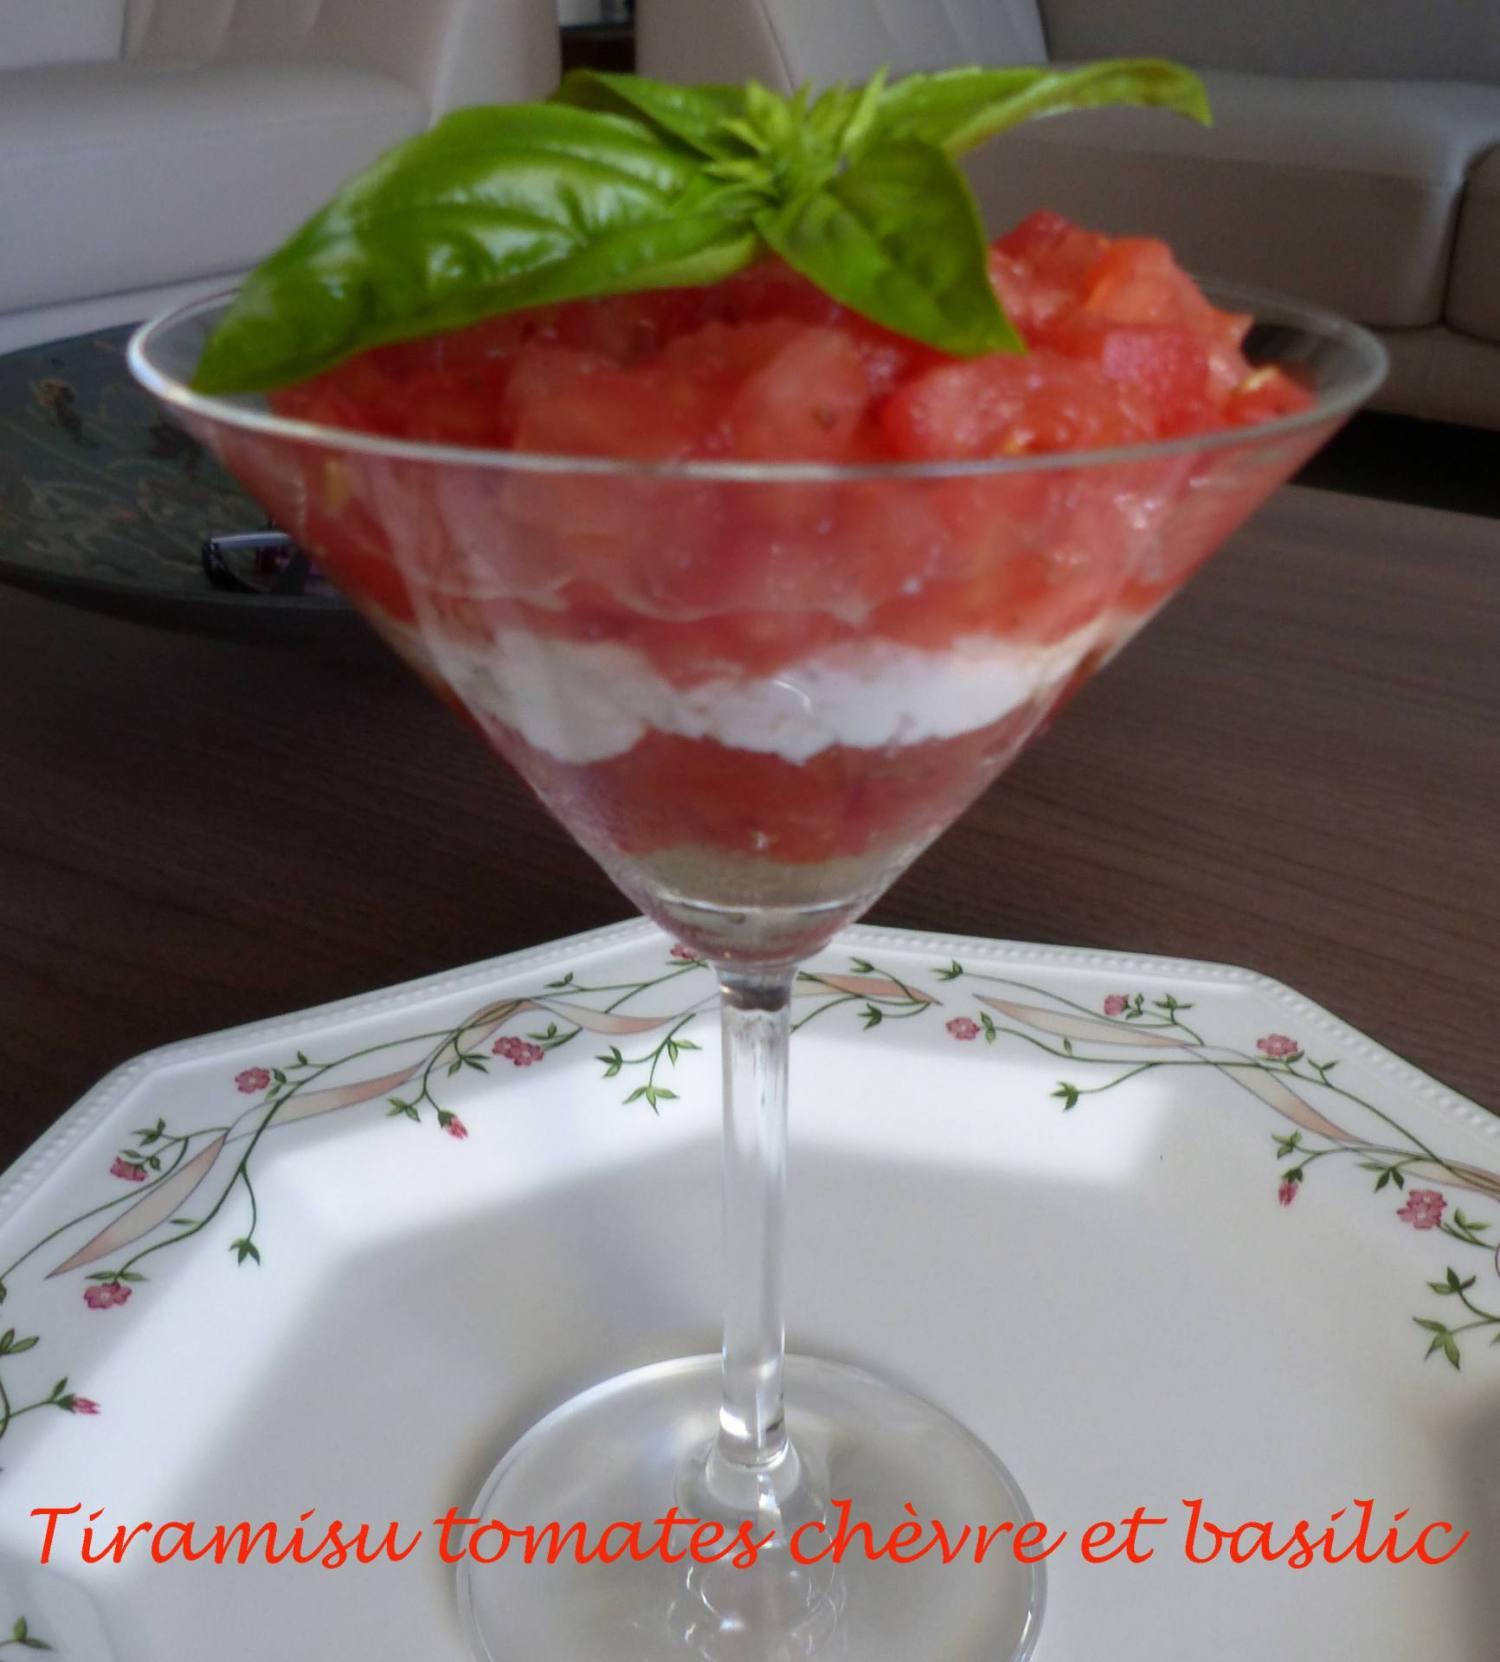 Tiramisu tomates chèvre et basilic P1190666 R